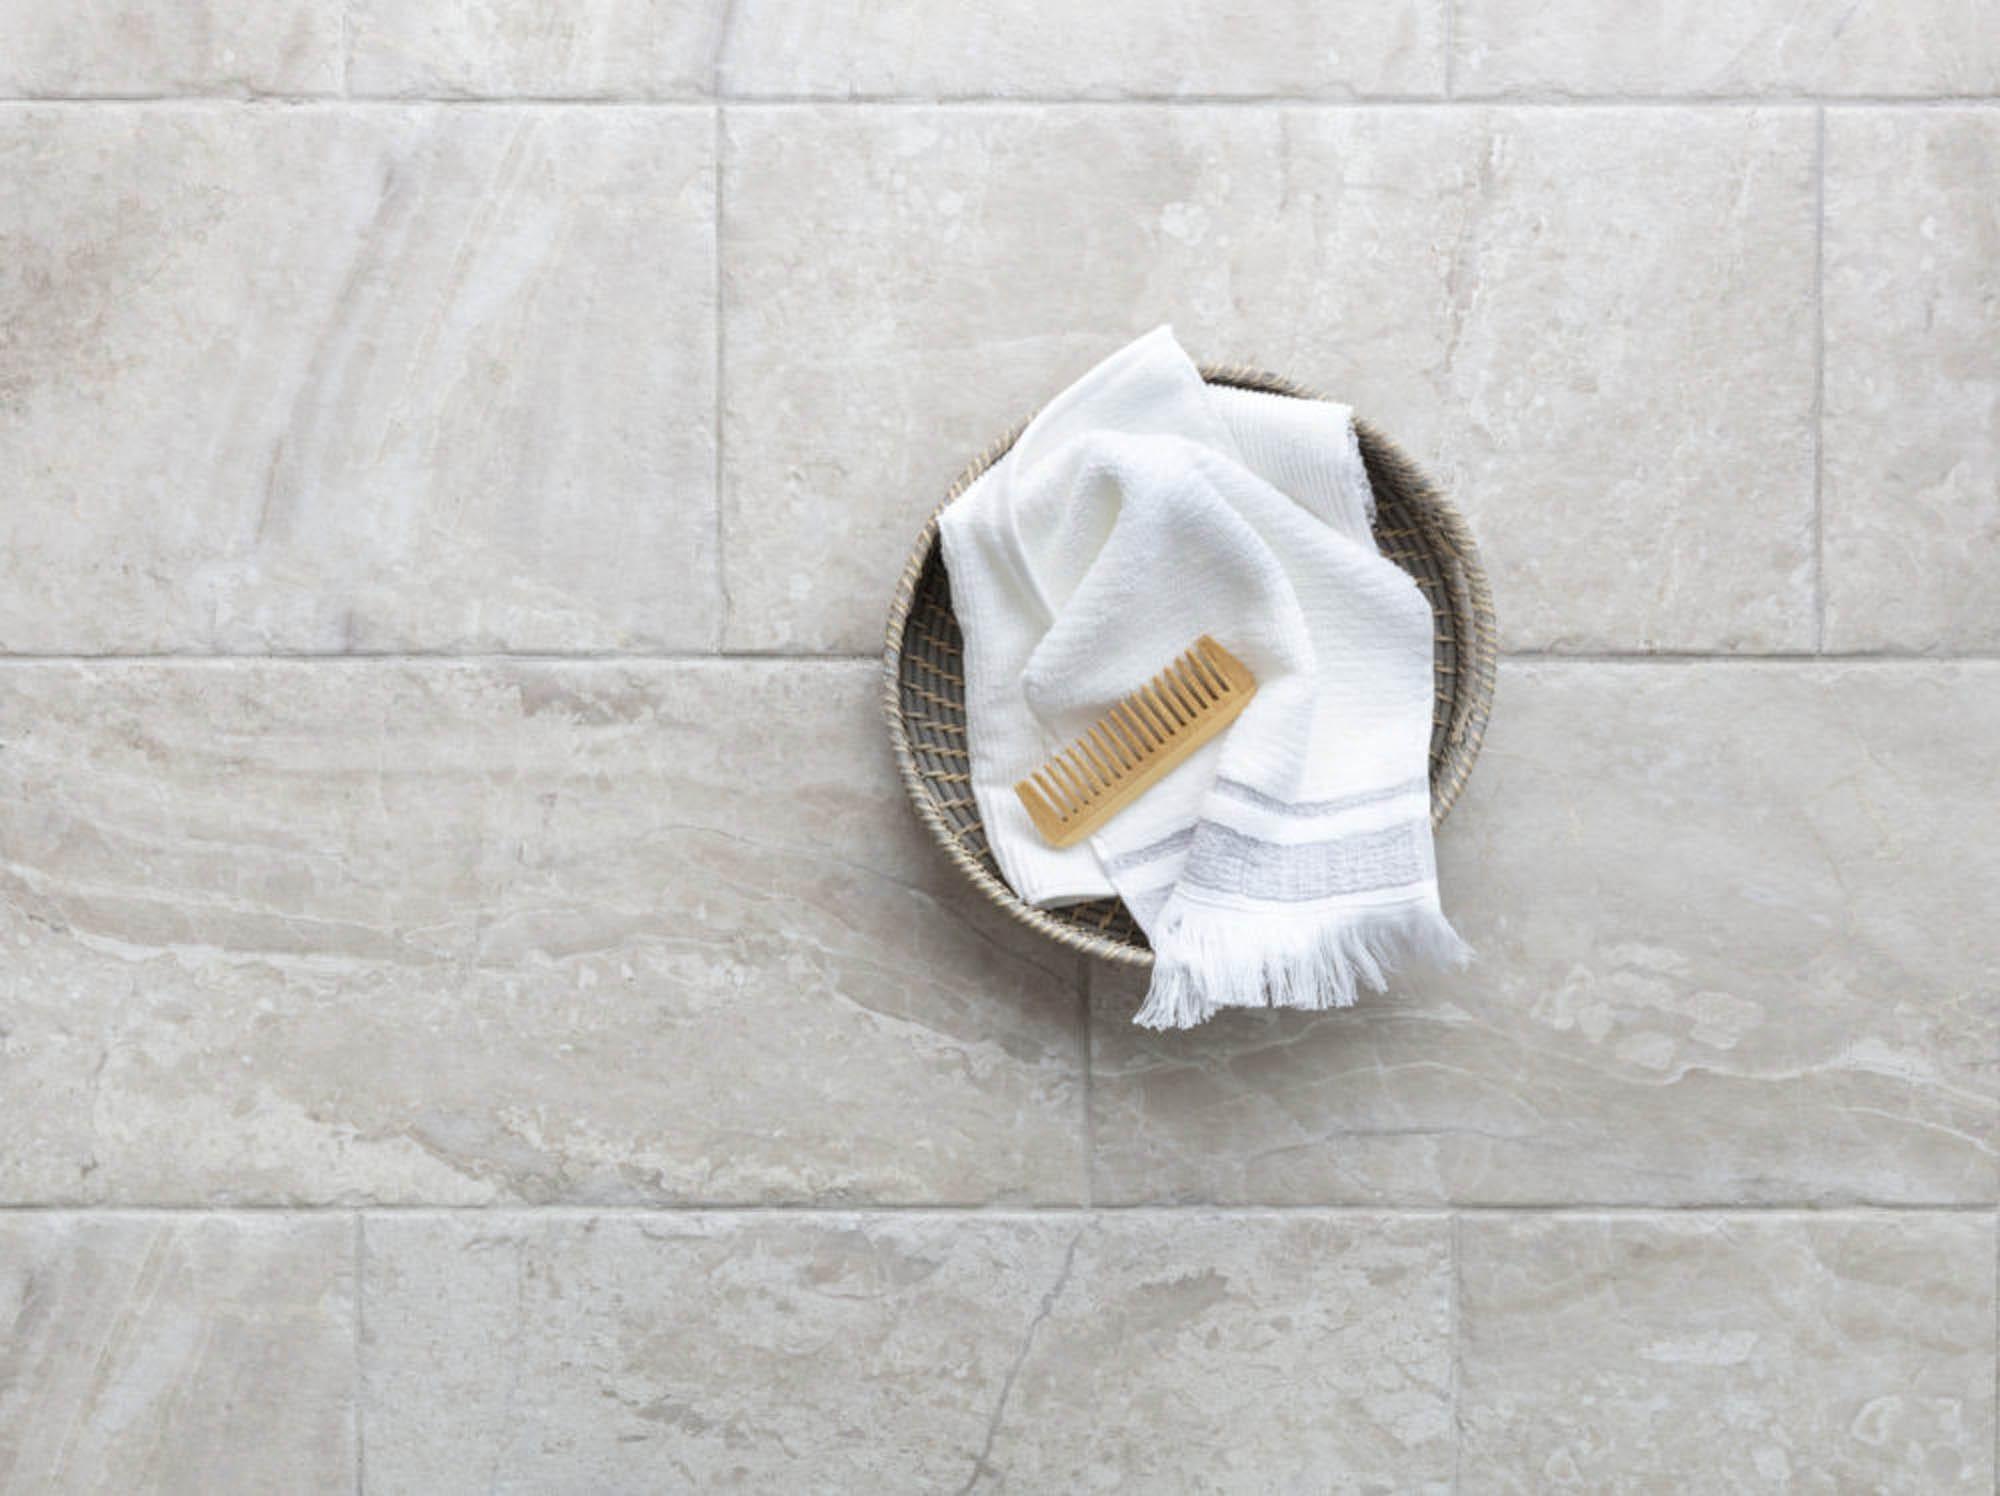 Textured bathroom floor tile